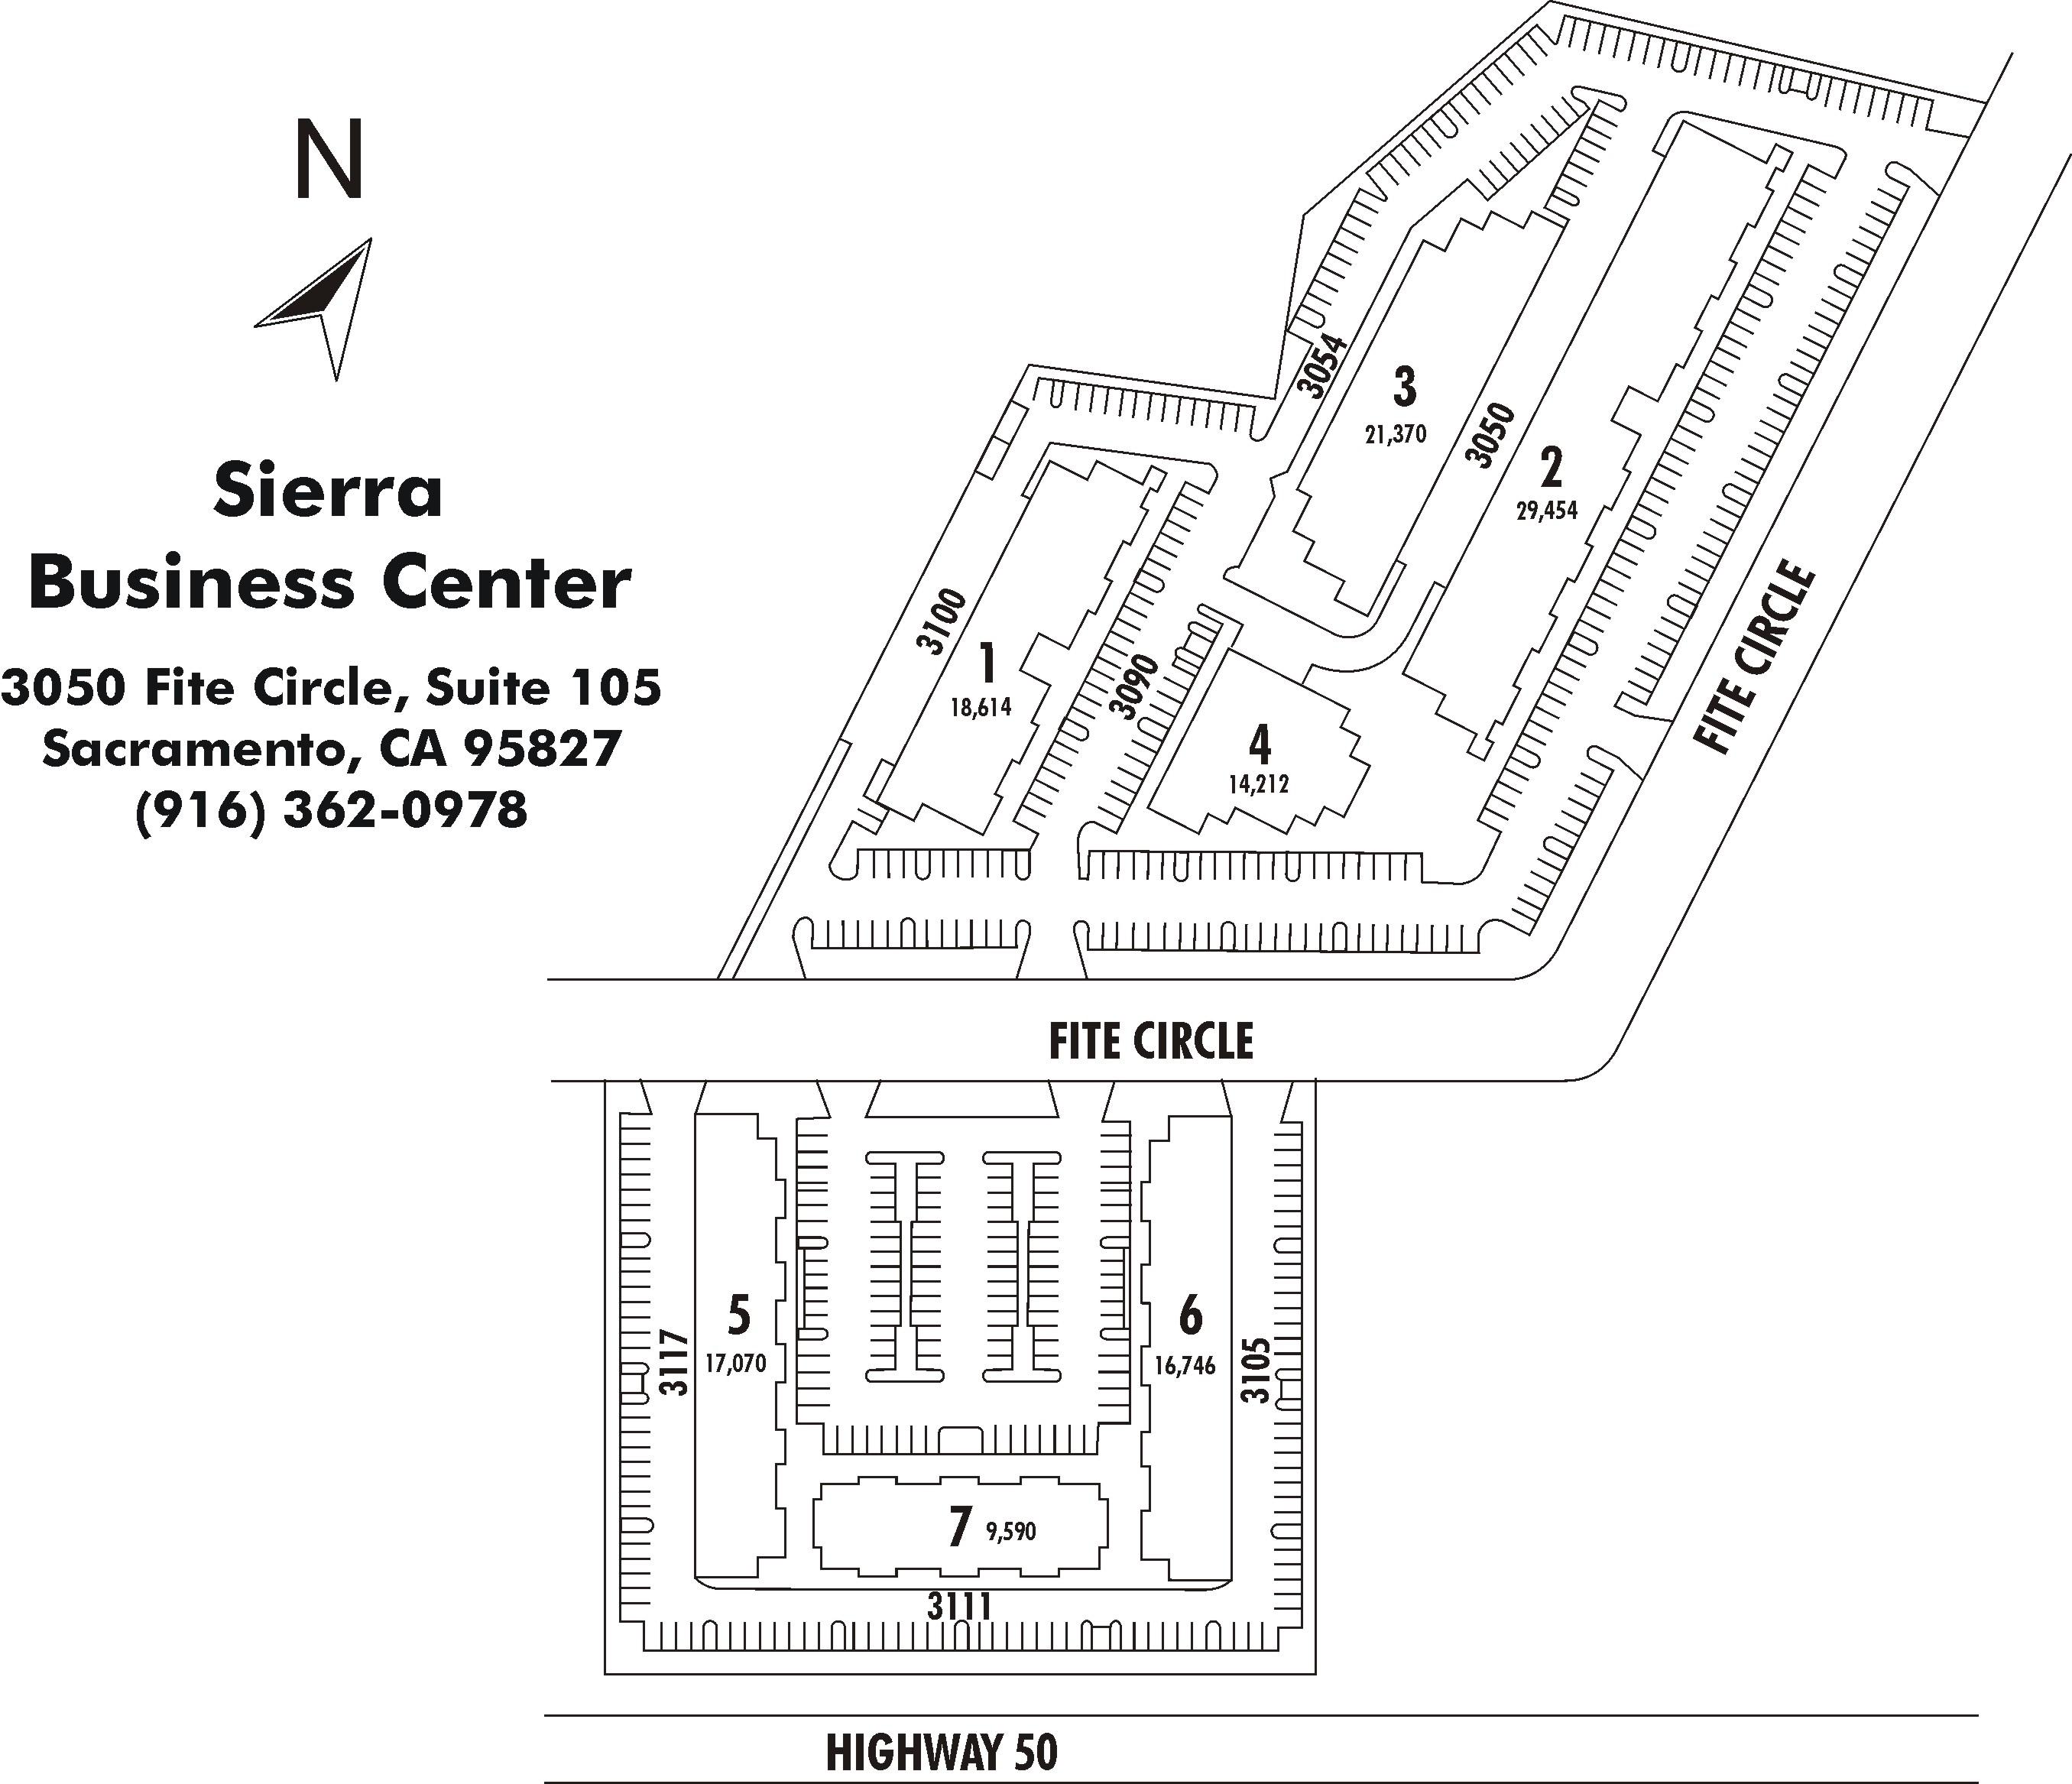 Sierra Business Center Property Map